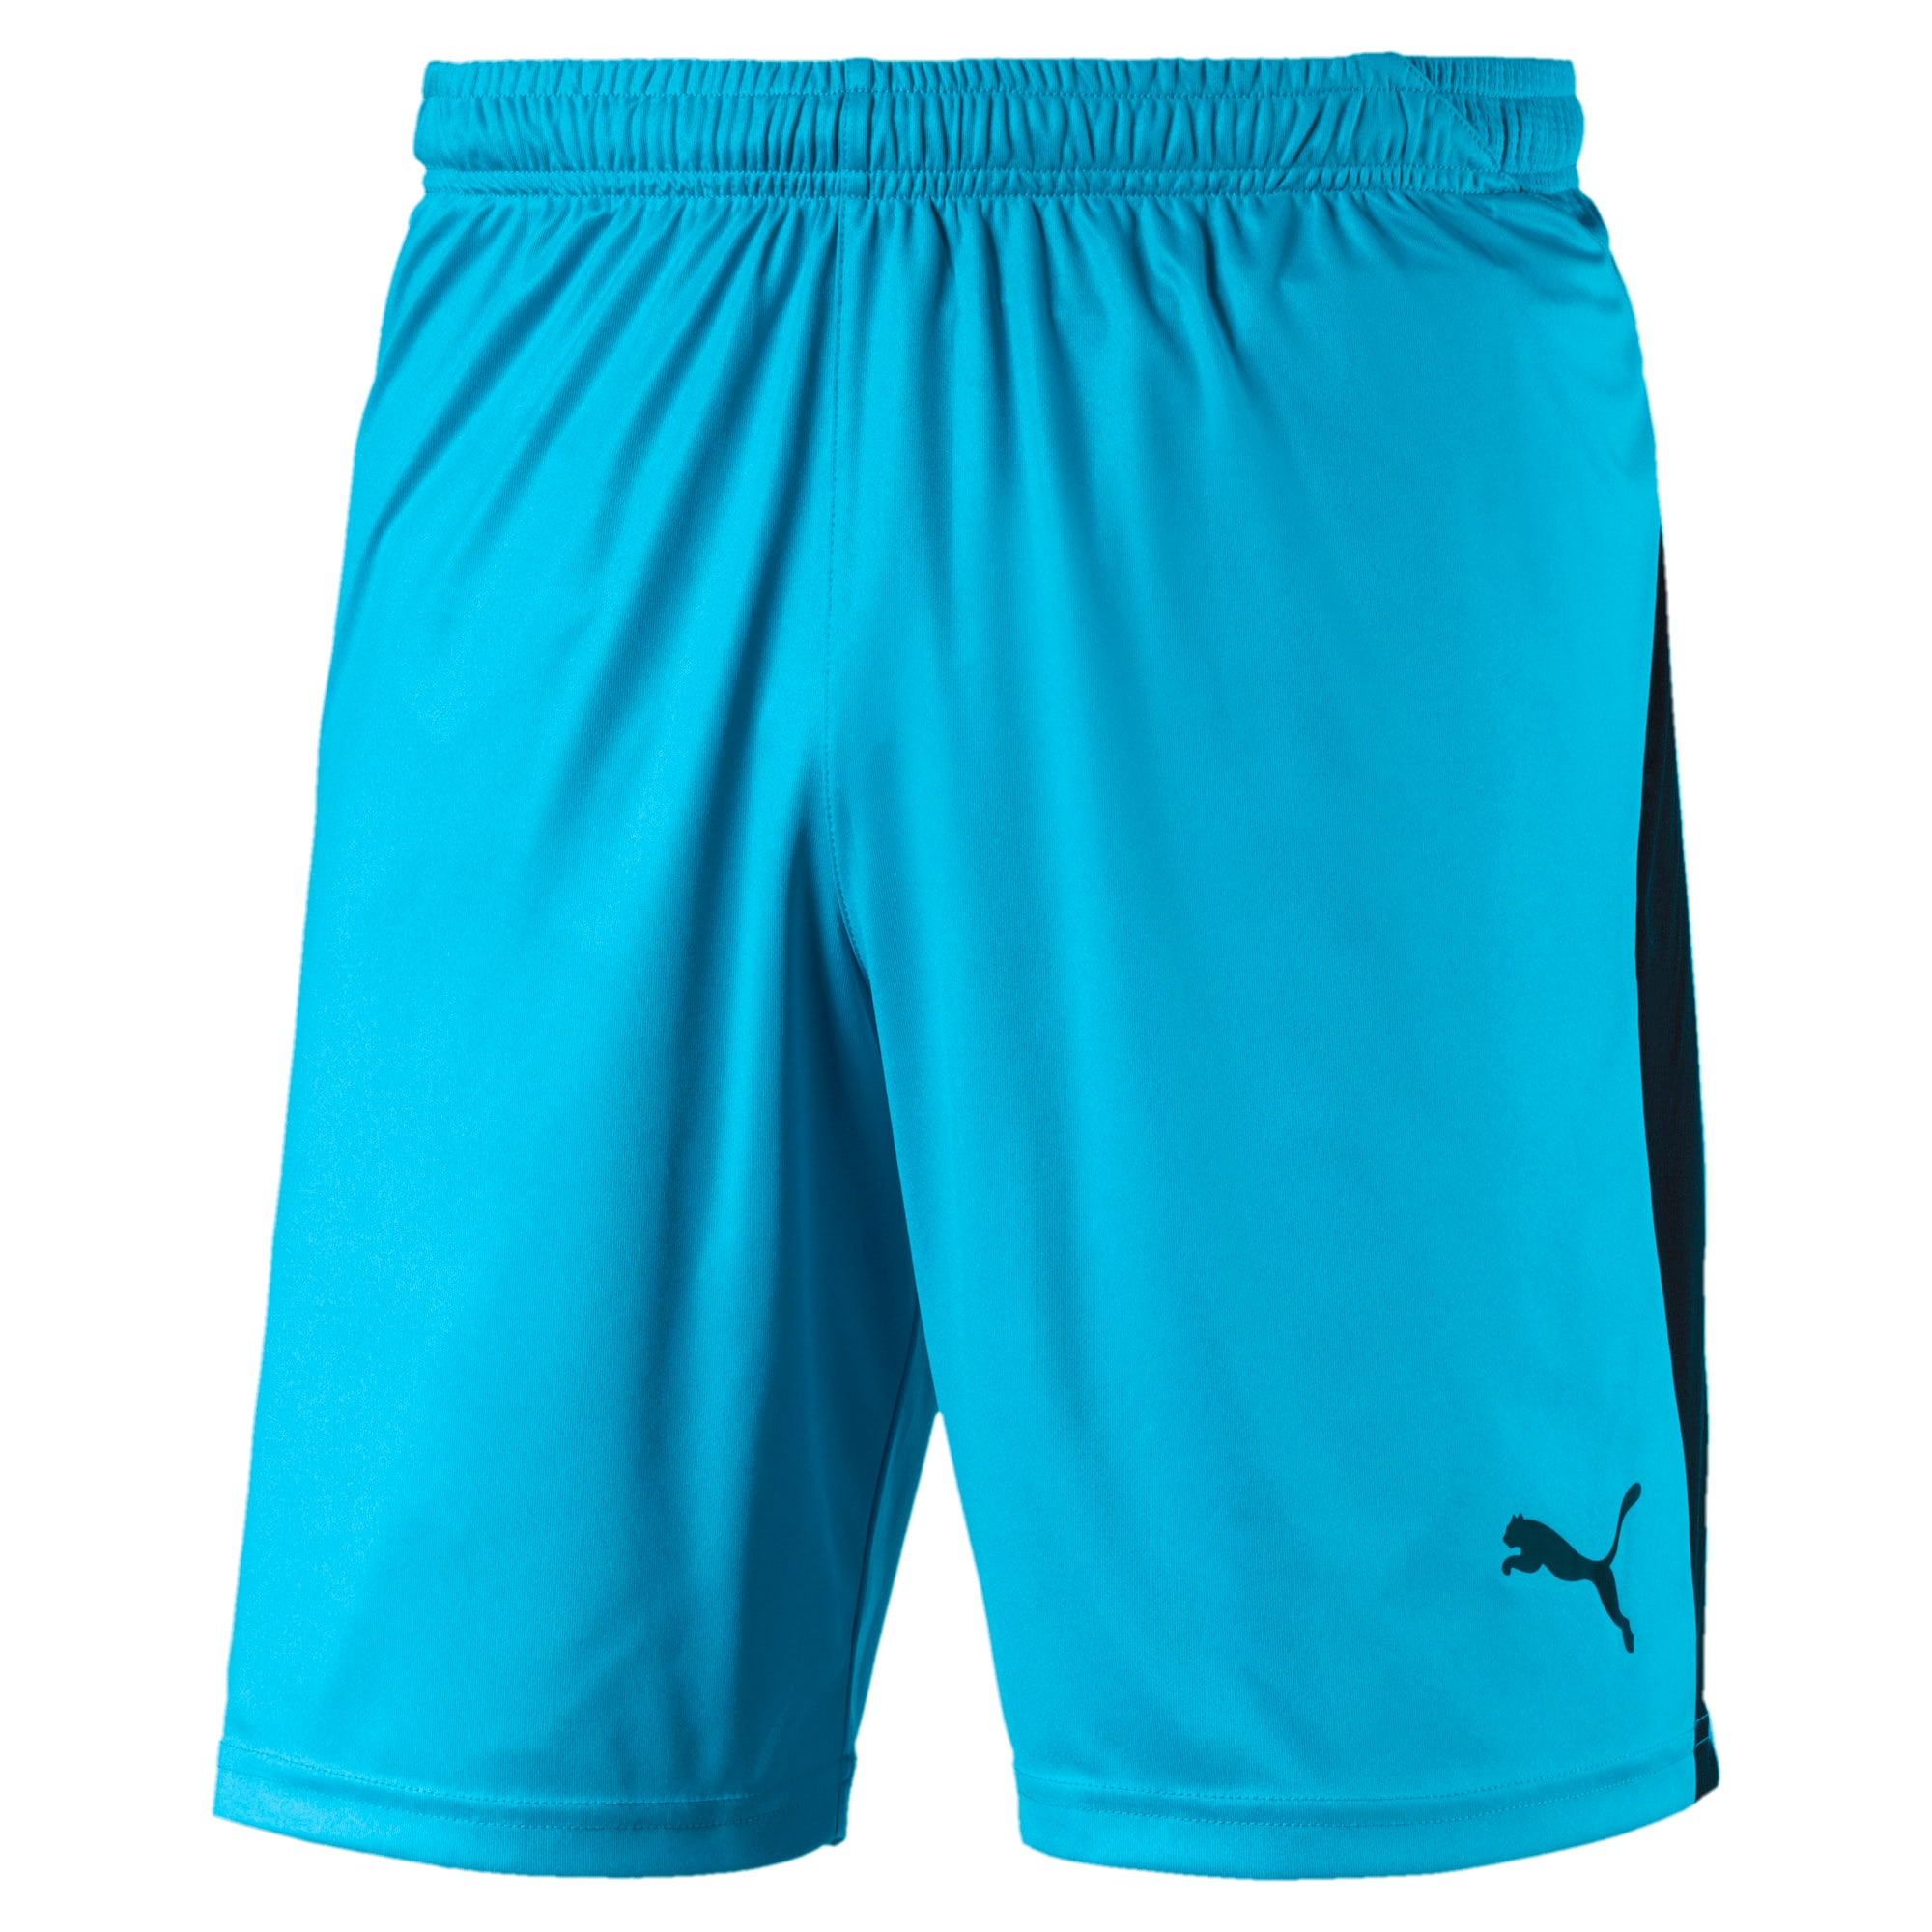 Thumbnail 1 of Liga Men's Shorts, AQUARIUS-Puma Black, medium